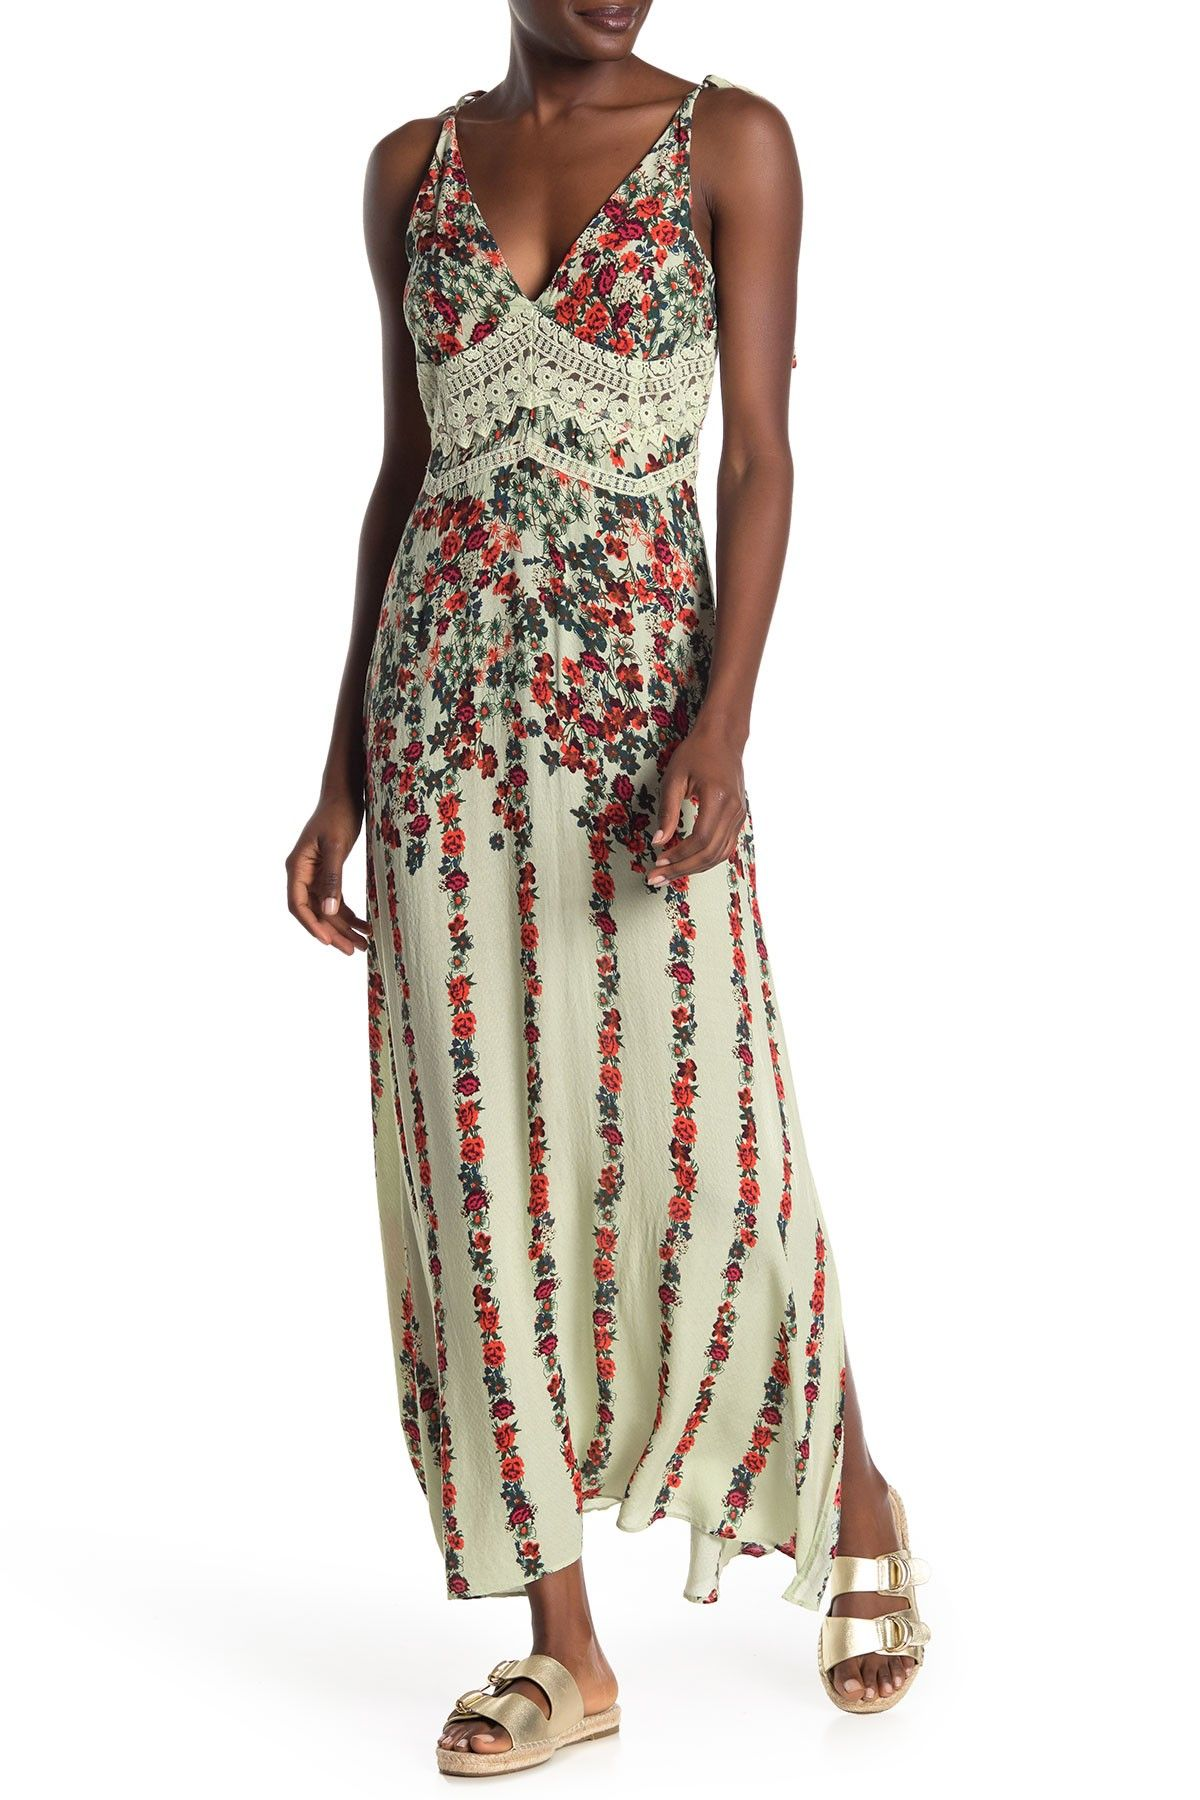 Free People Claire Floral Maxi Dress Maxi Dress Dresses